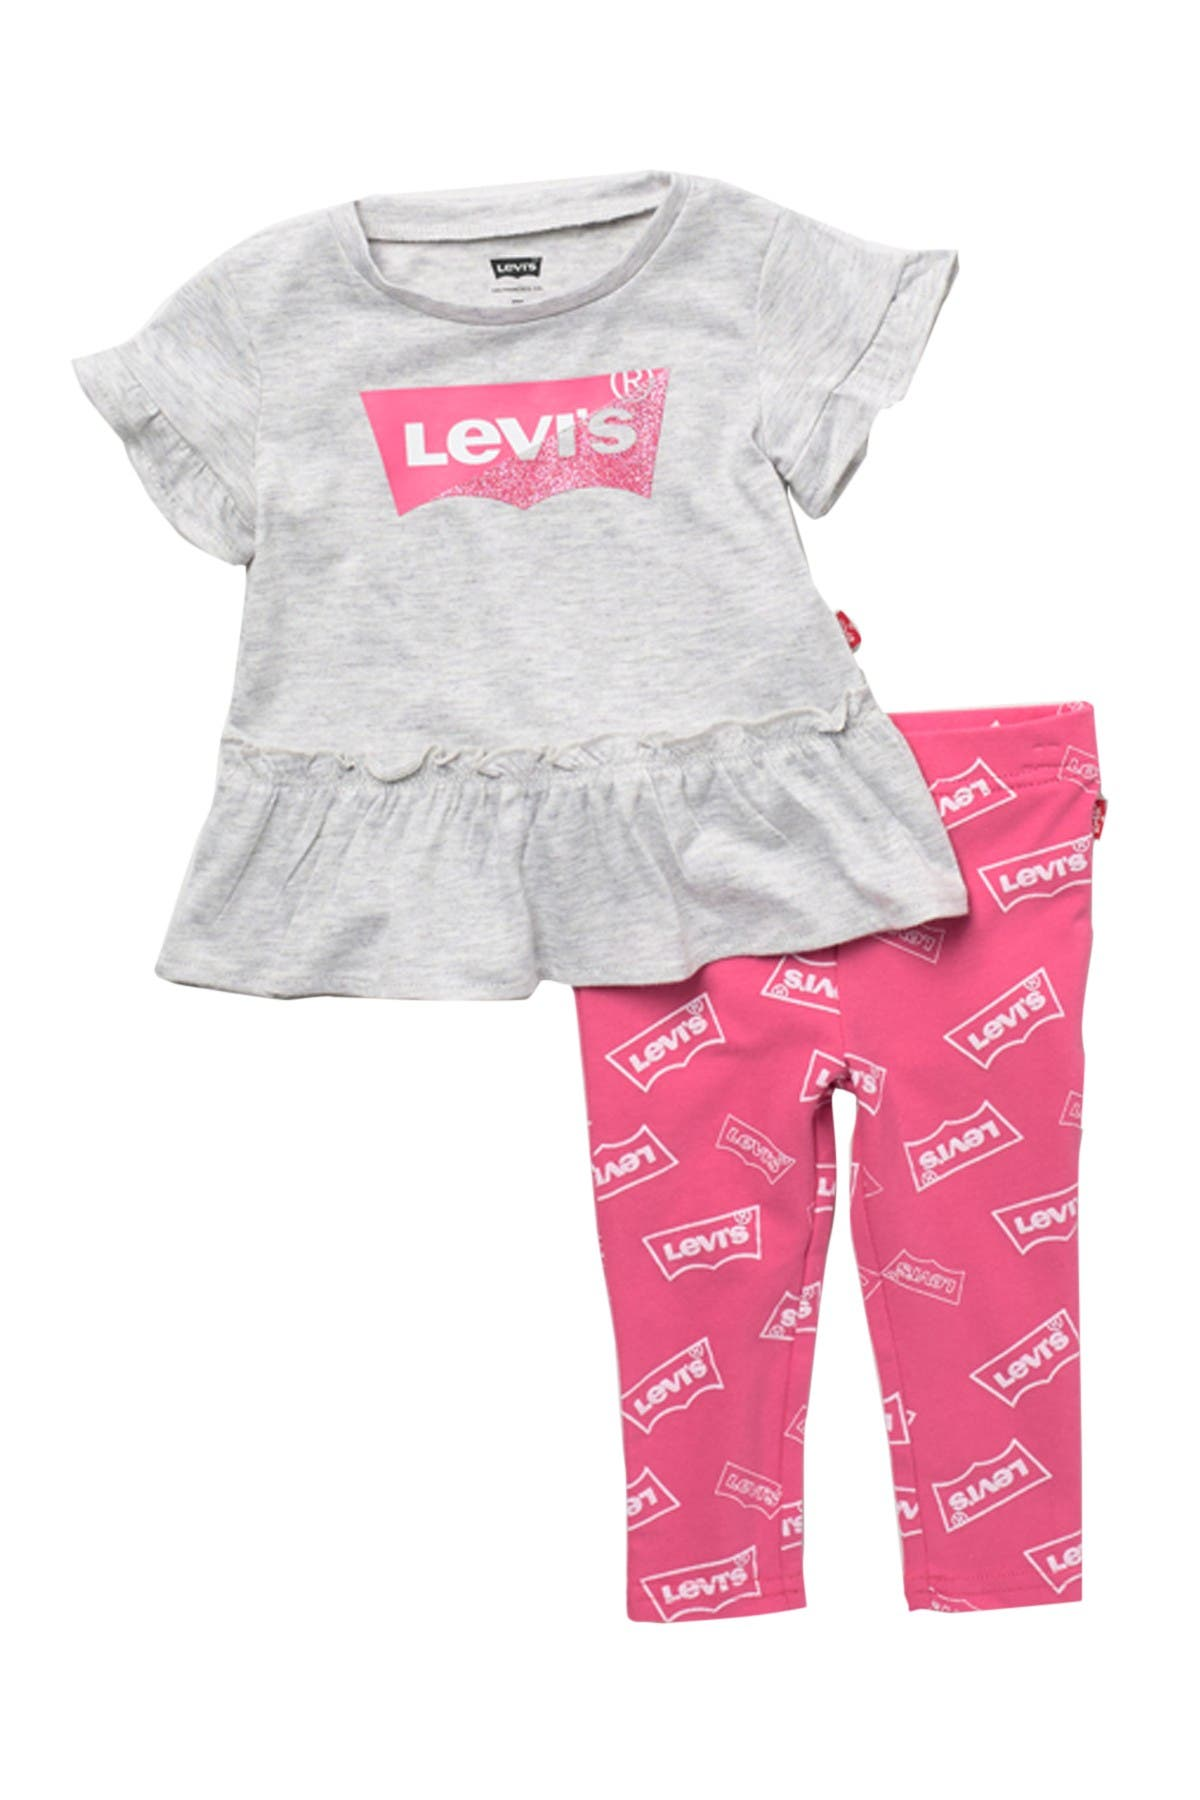 Image of Levi's Ruffle Tunic Top & Leggings Set